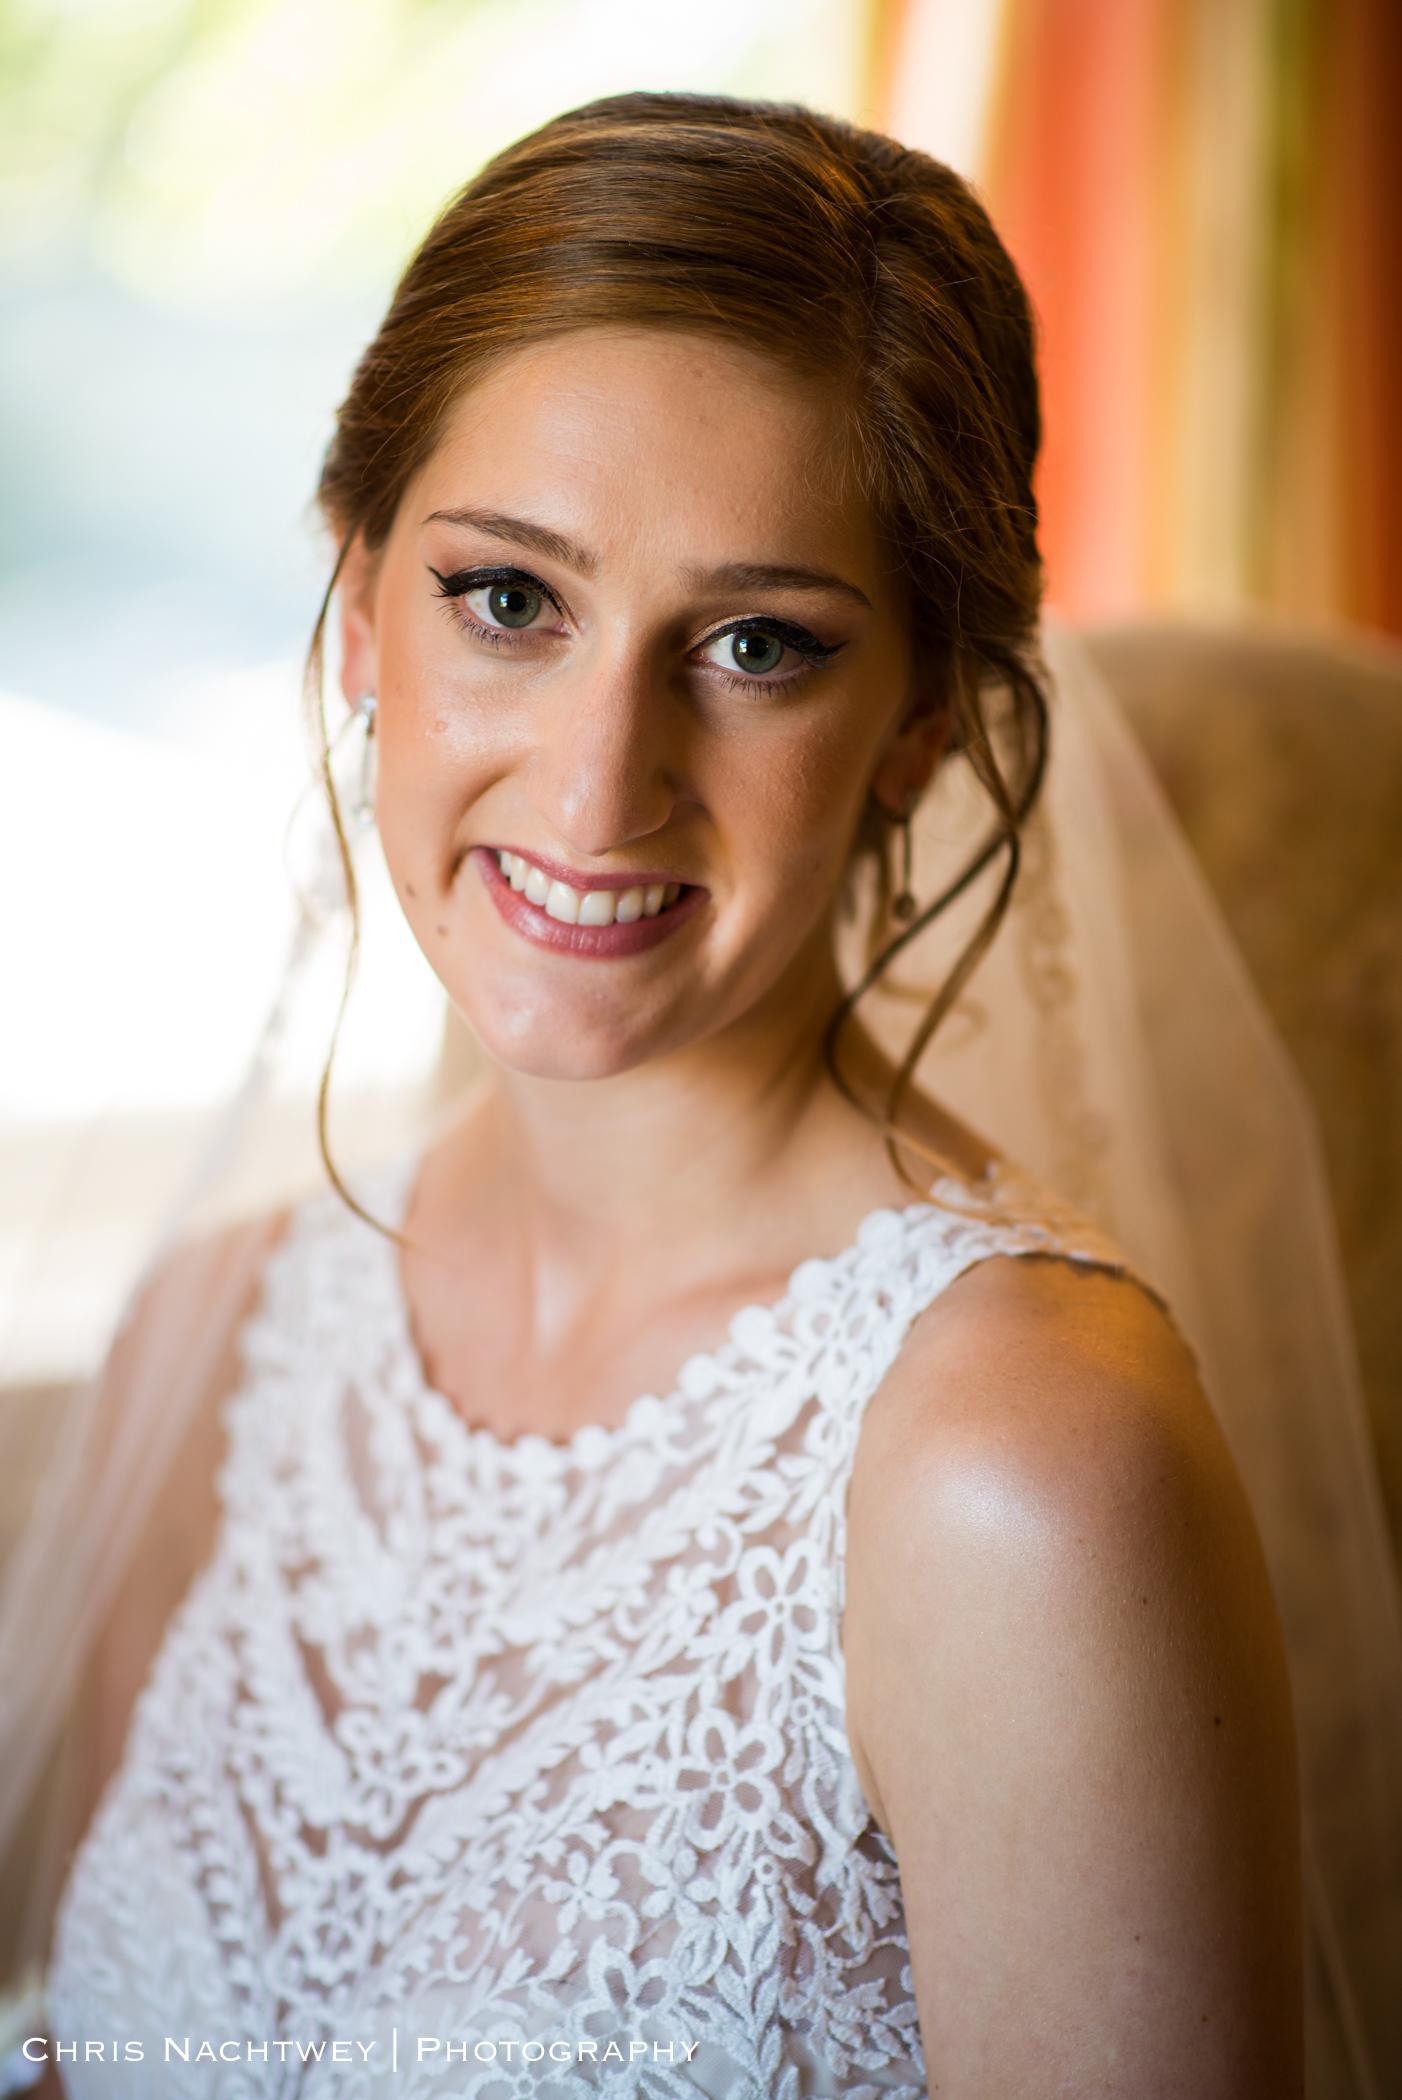 harkness-wedding-photos-chris-nachtwey-photography-2018-11.jpg